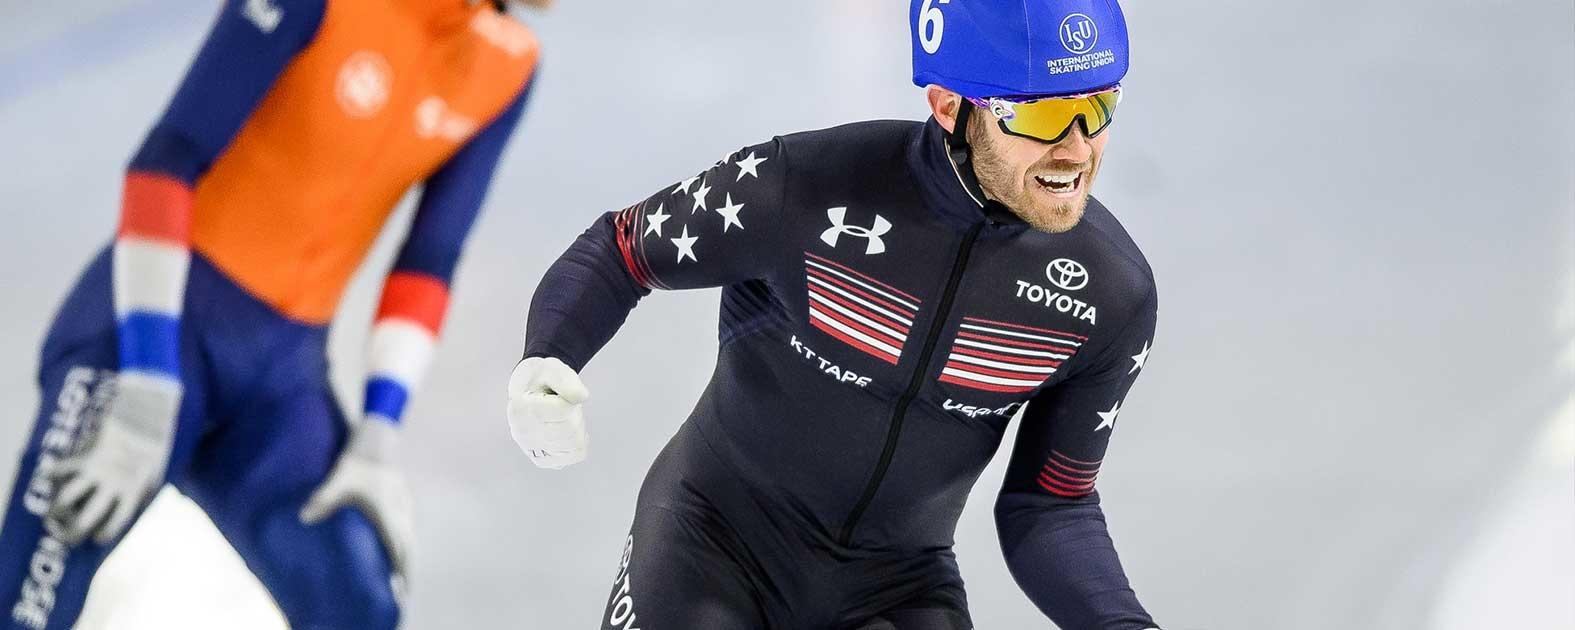 Joey Mantia World Champion ice speedskating